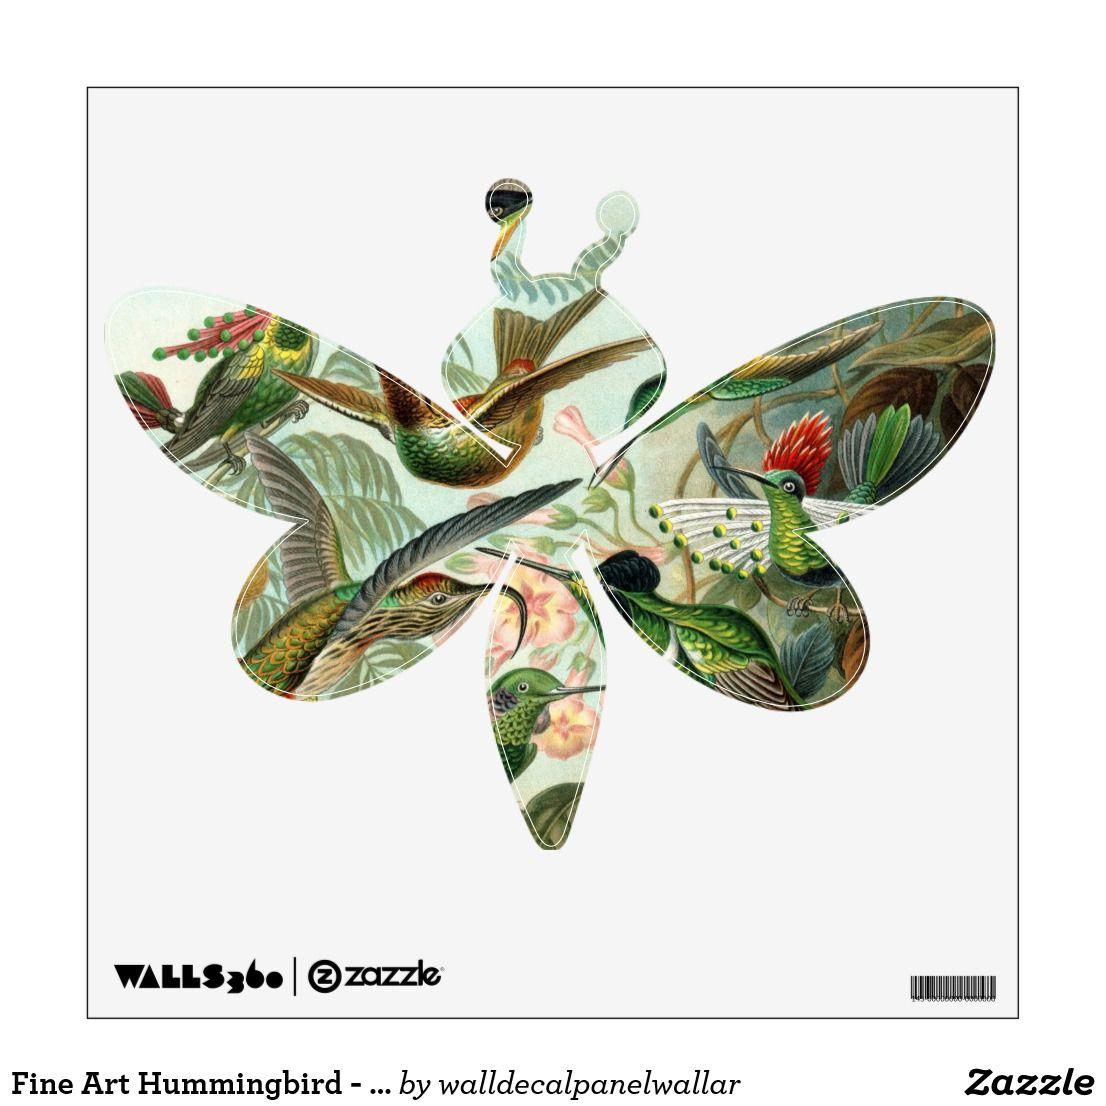 Fine Art Hummingbird Art Forms of Nature Wall Decal